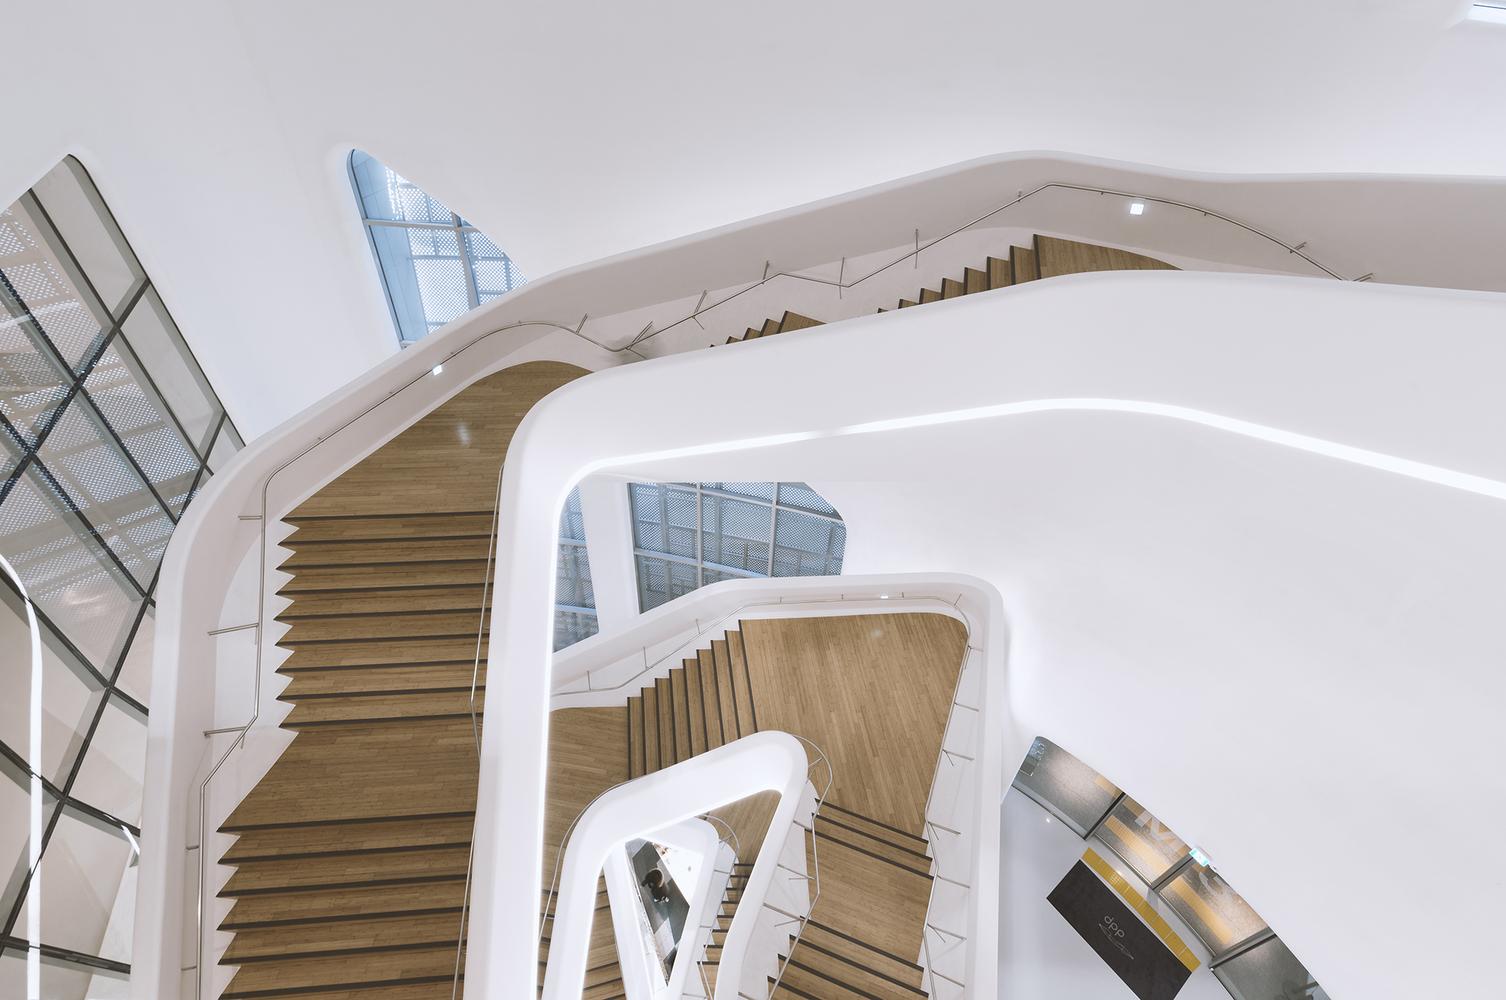 Gallery of Zaha Hadid\'s Dongdaemun Design Plaza Through the Lens of ...